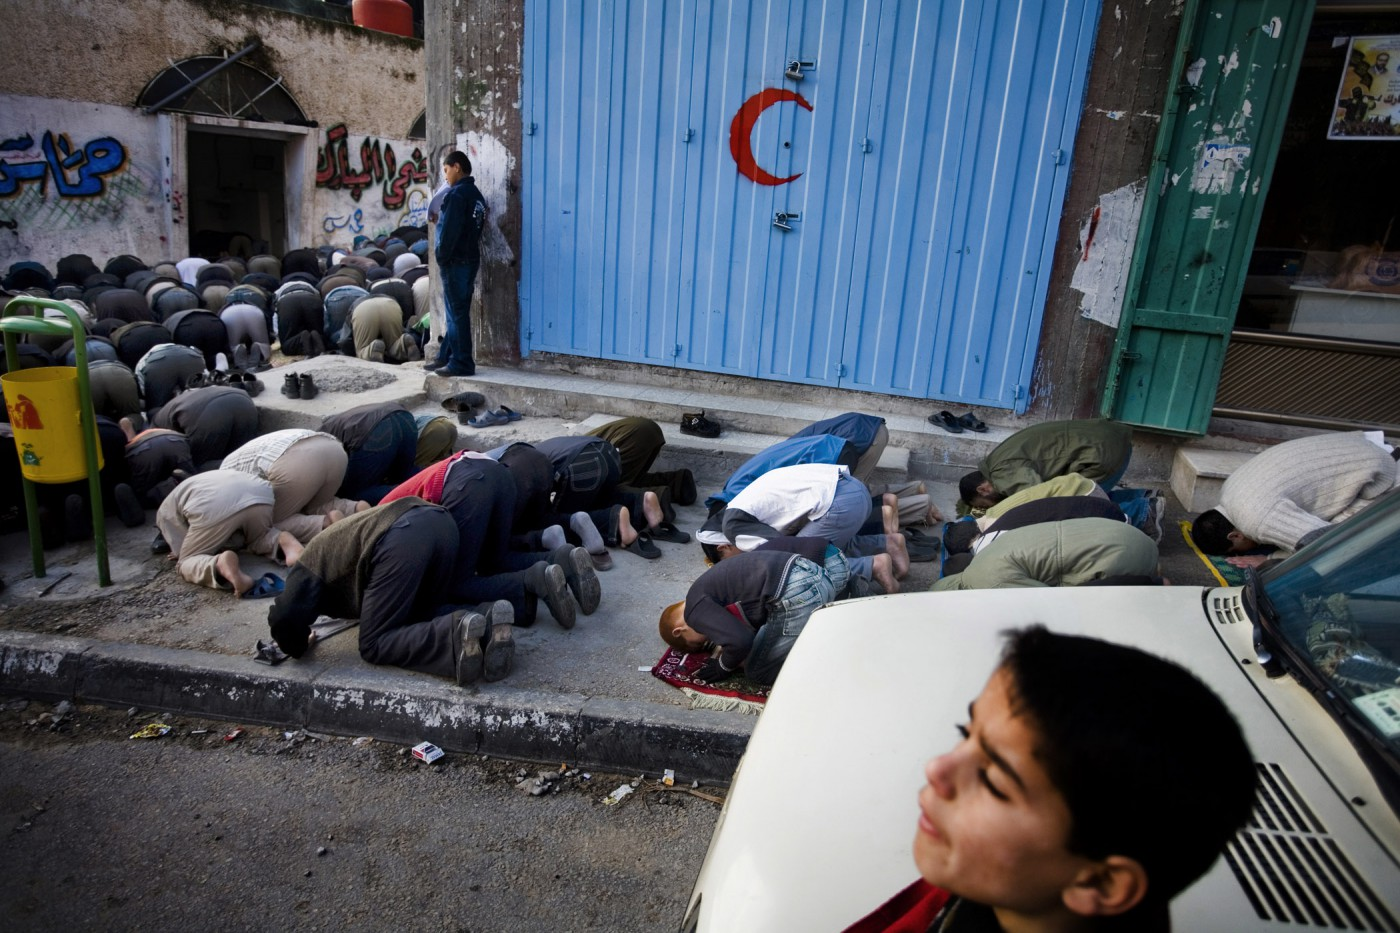 Dominic Nahr, </span><span><em>Come to Prayer / Come to Success, The Gaza Strip, 2007</em>, </span><span>Digital Print